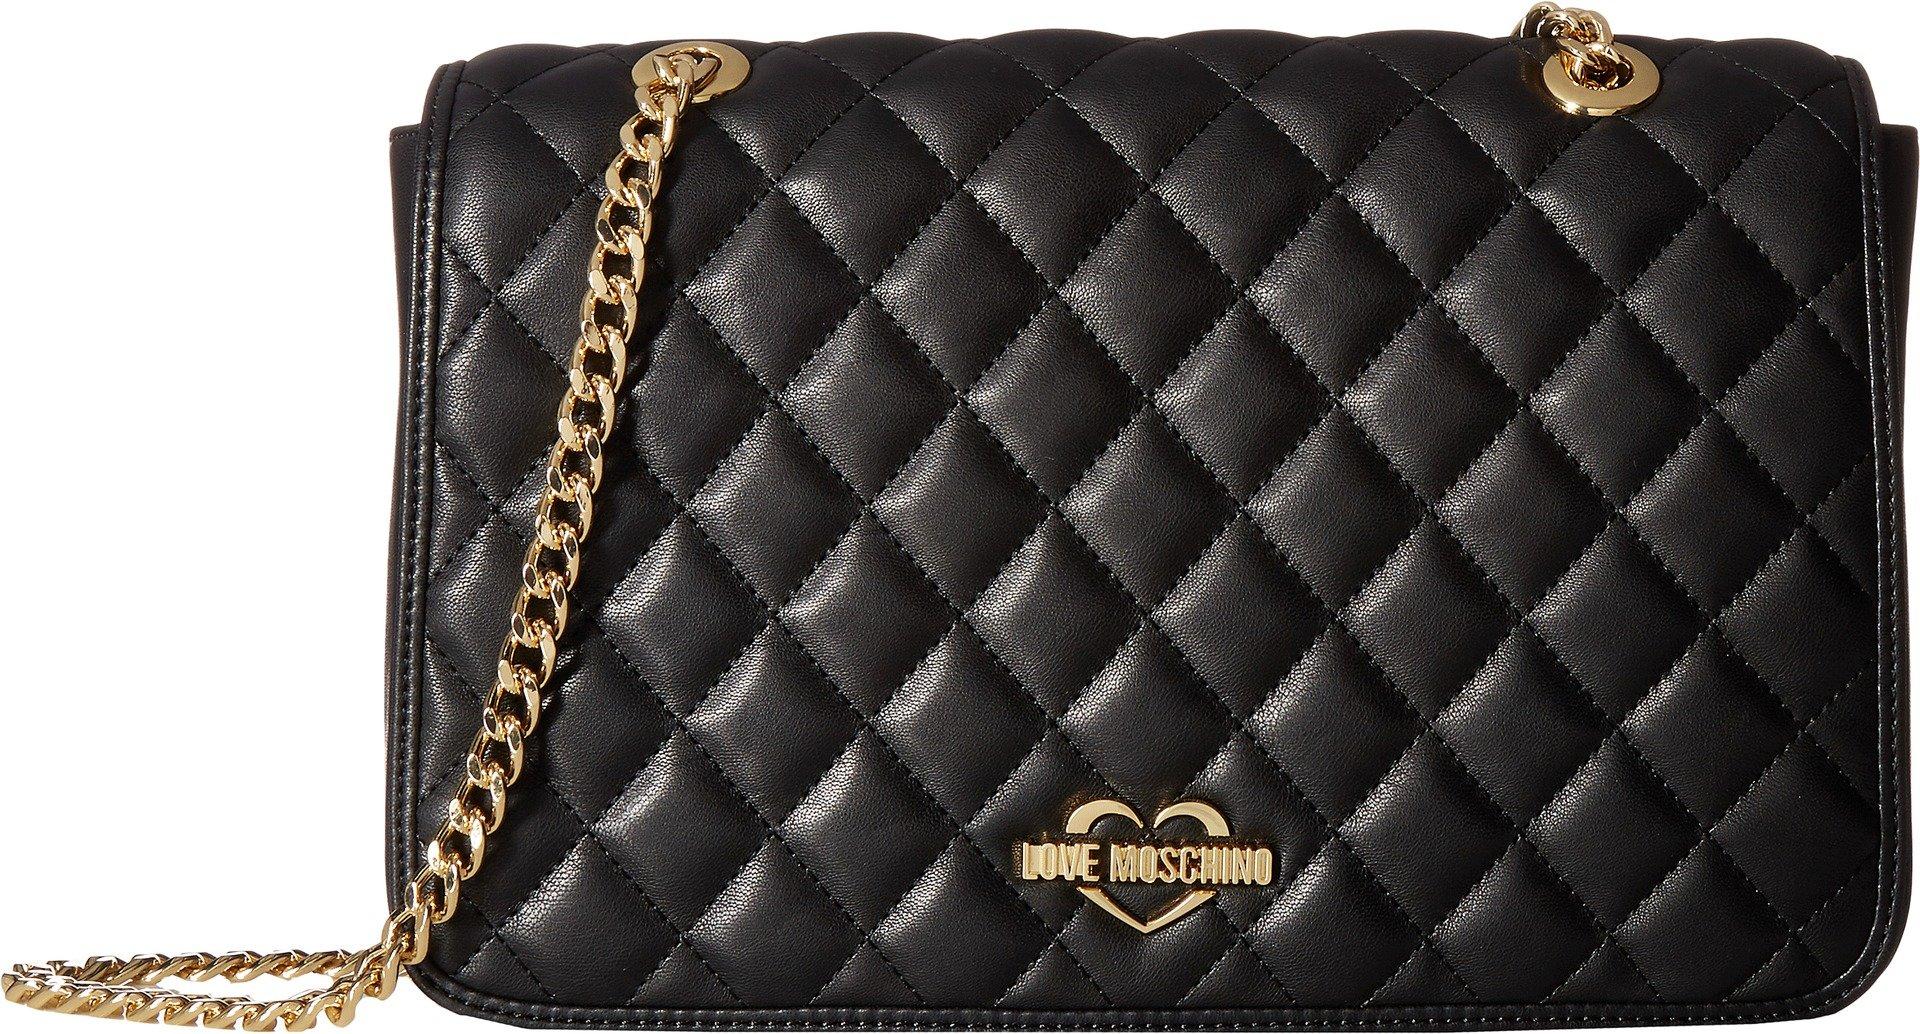 LOVE Moschino Women's Superquilting Shoulder Bag Black Handbag